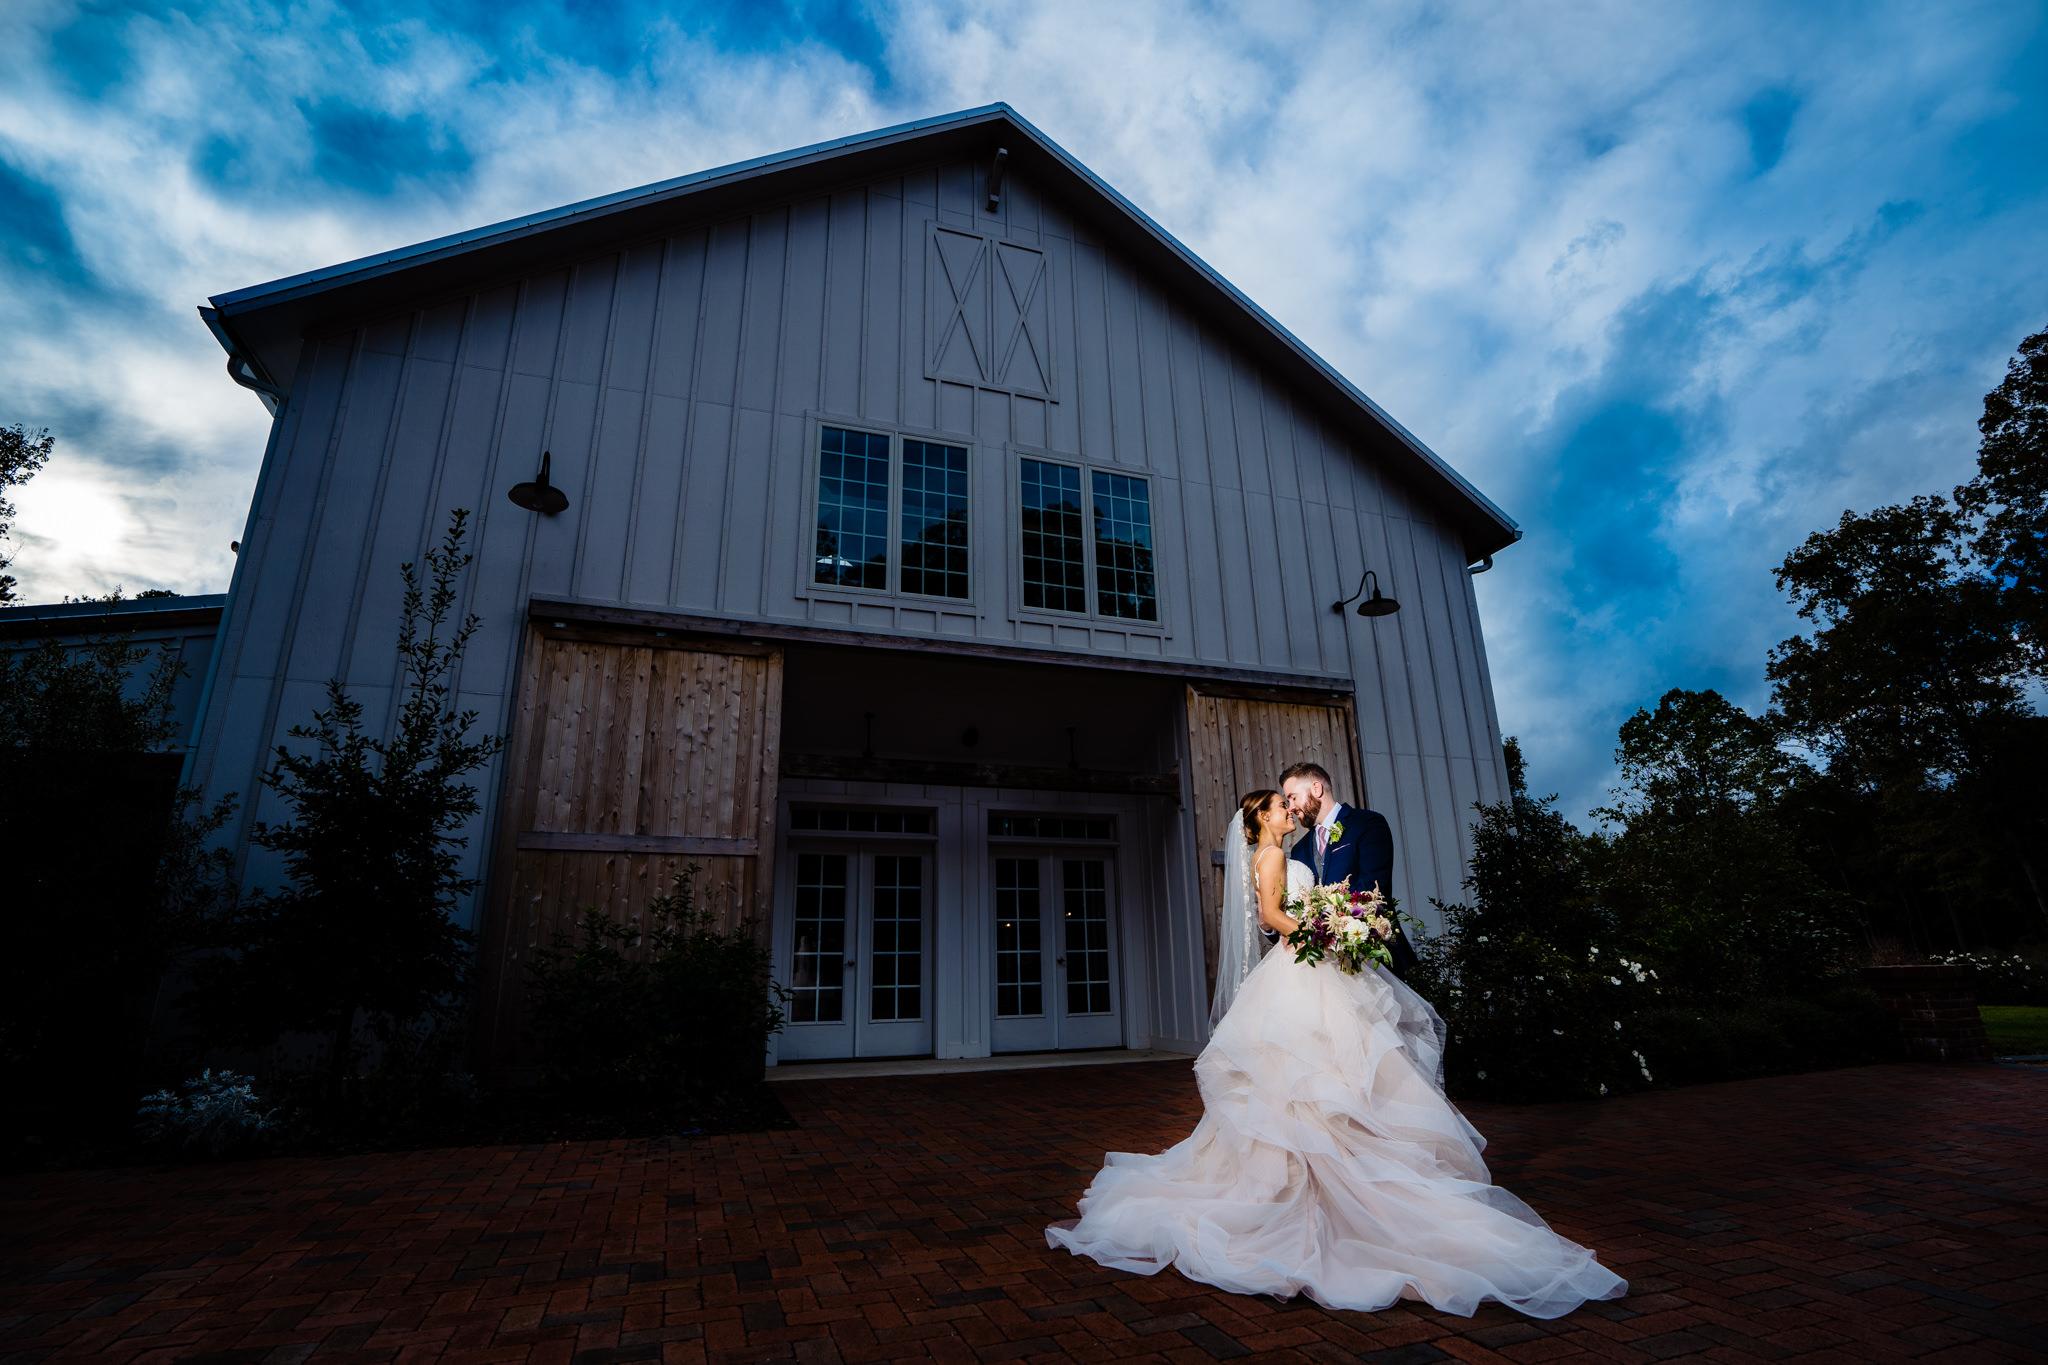 Emily&Ron-Chapel-hill-wedding-barn-53.jpg